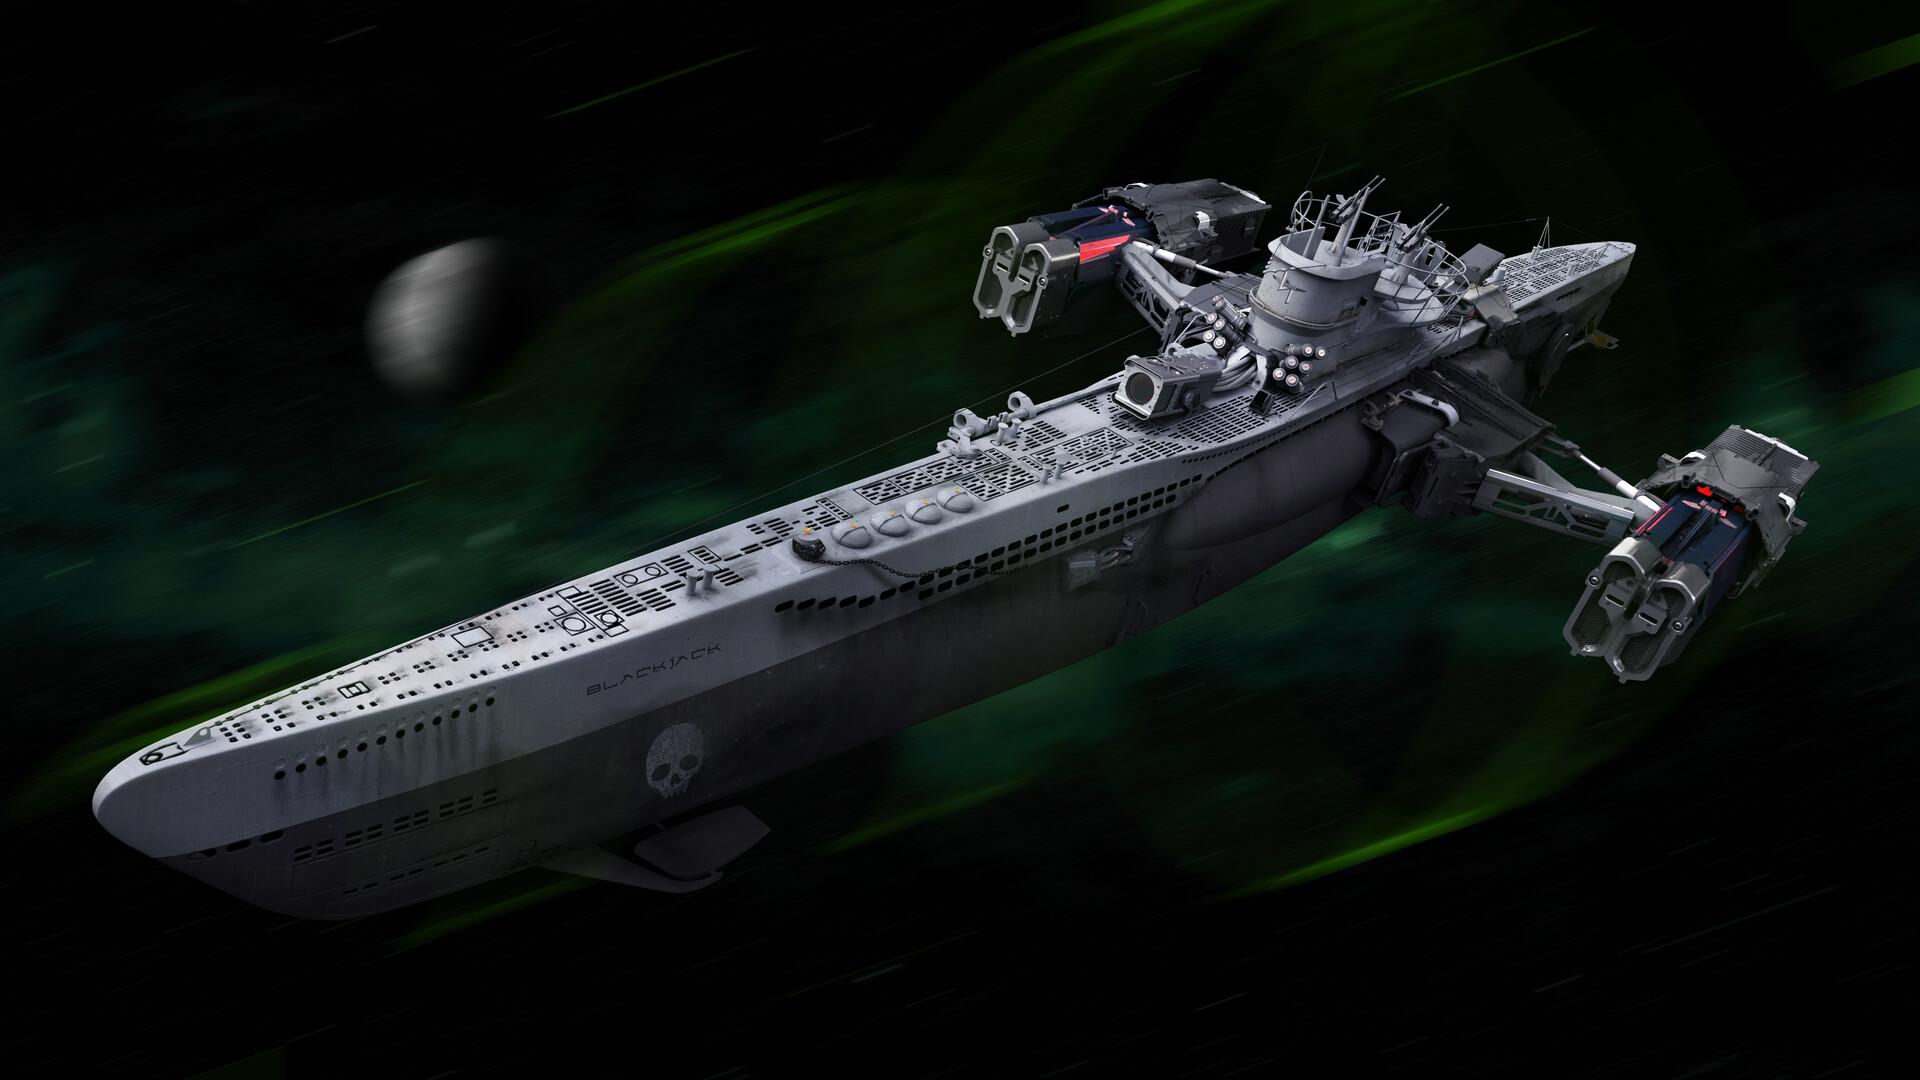 artstation - u-boats make great space pirate ships, josh shapiro